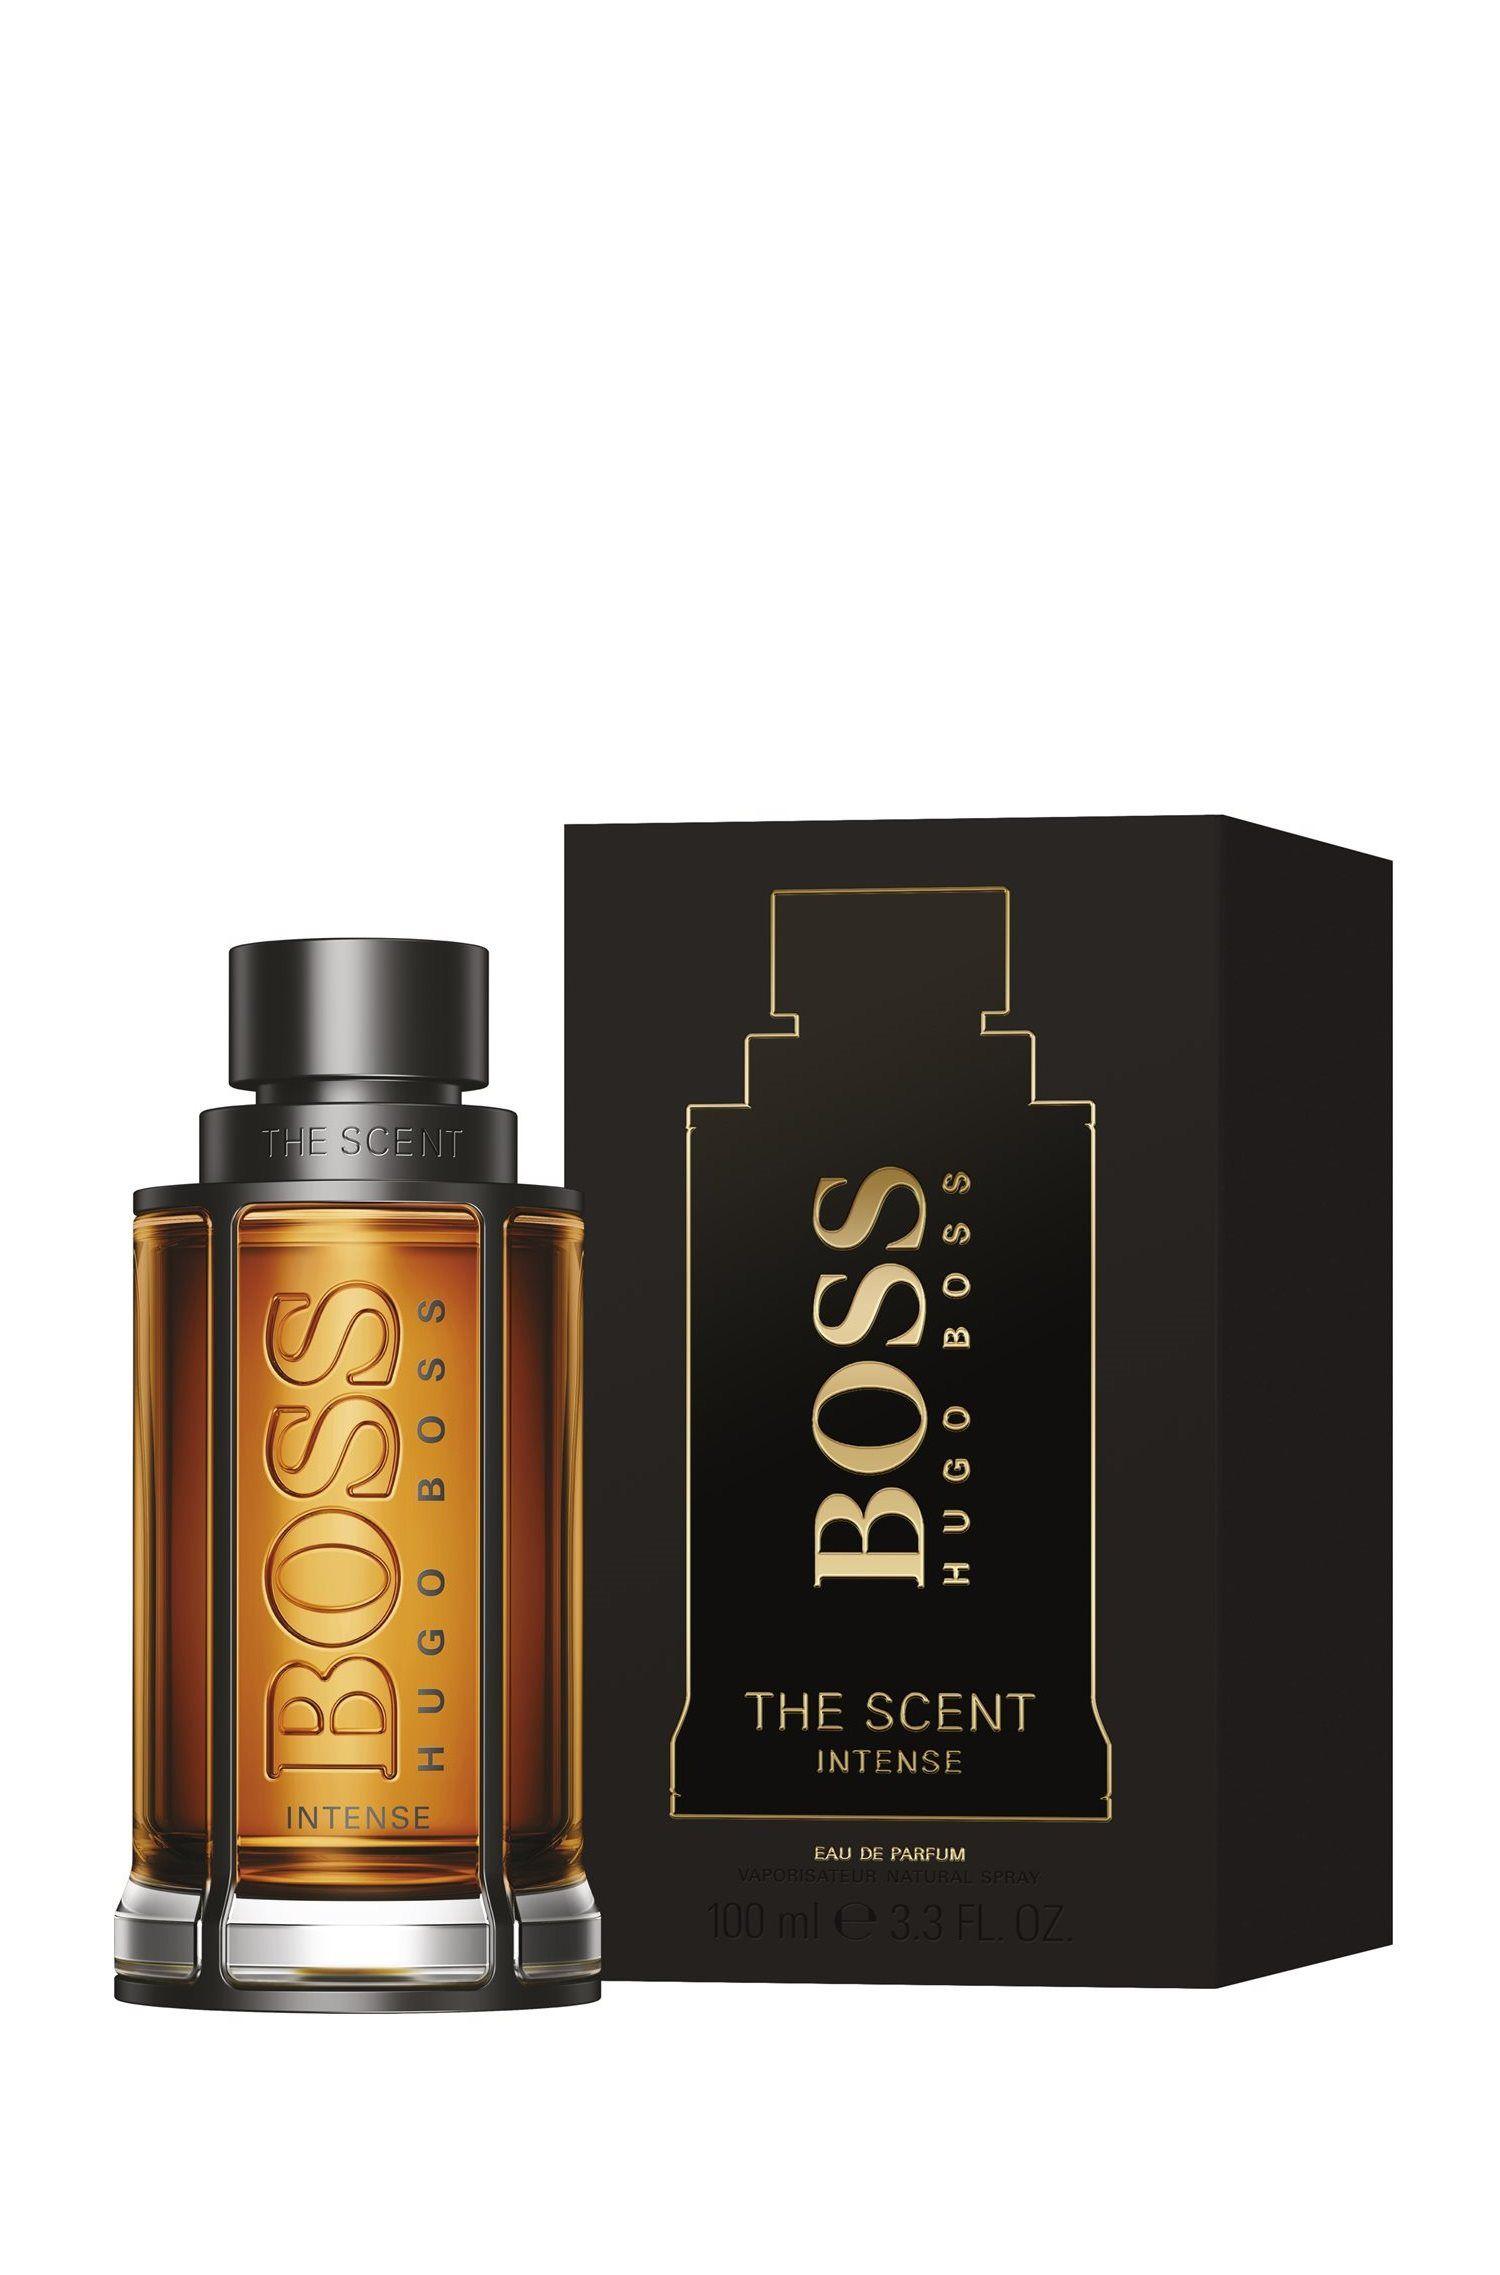 BOSS The Scent Intense for Him Eau de Parfum 100ml, Assorted-Pre-Pack